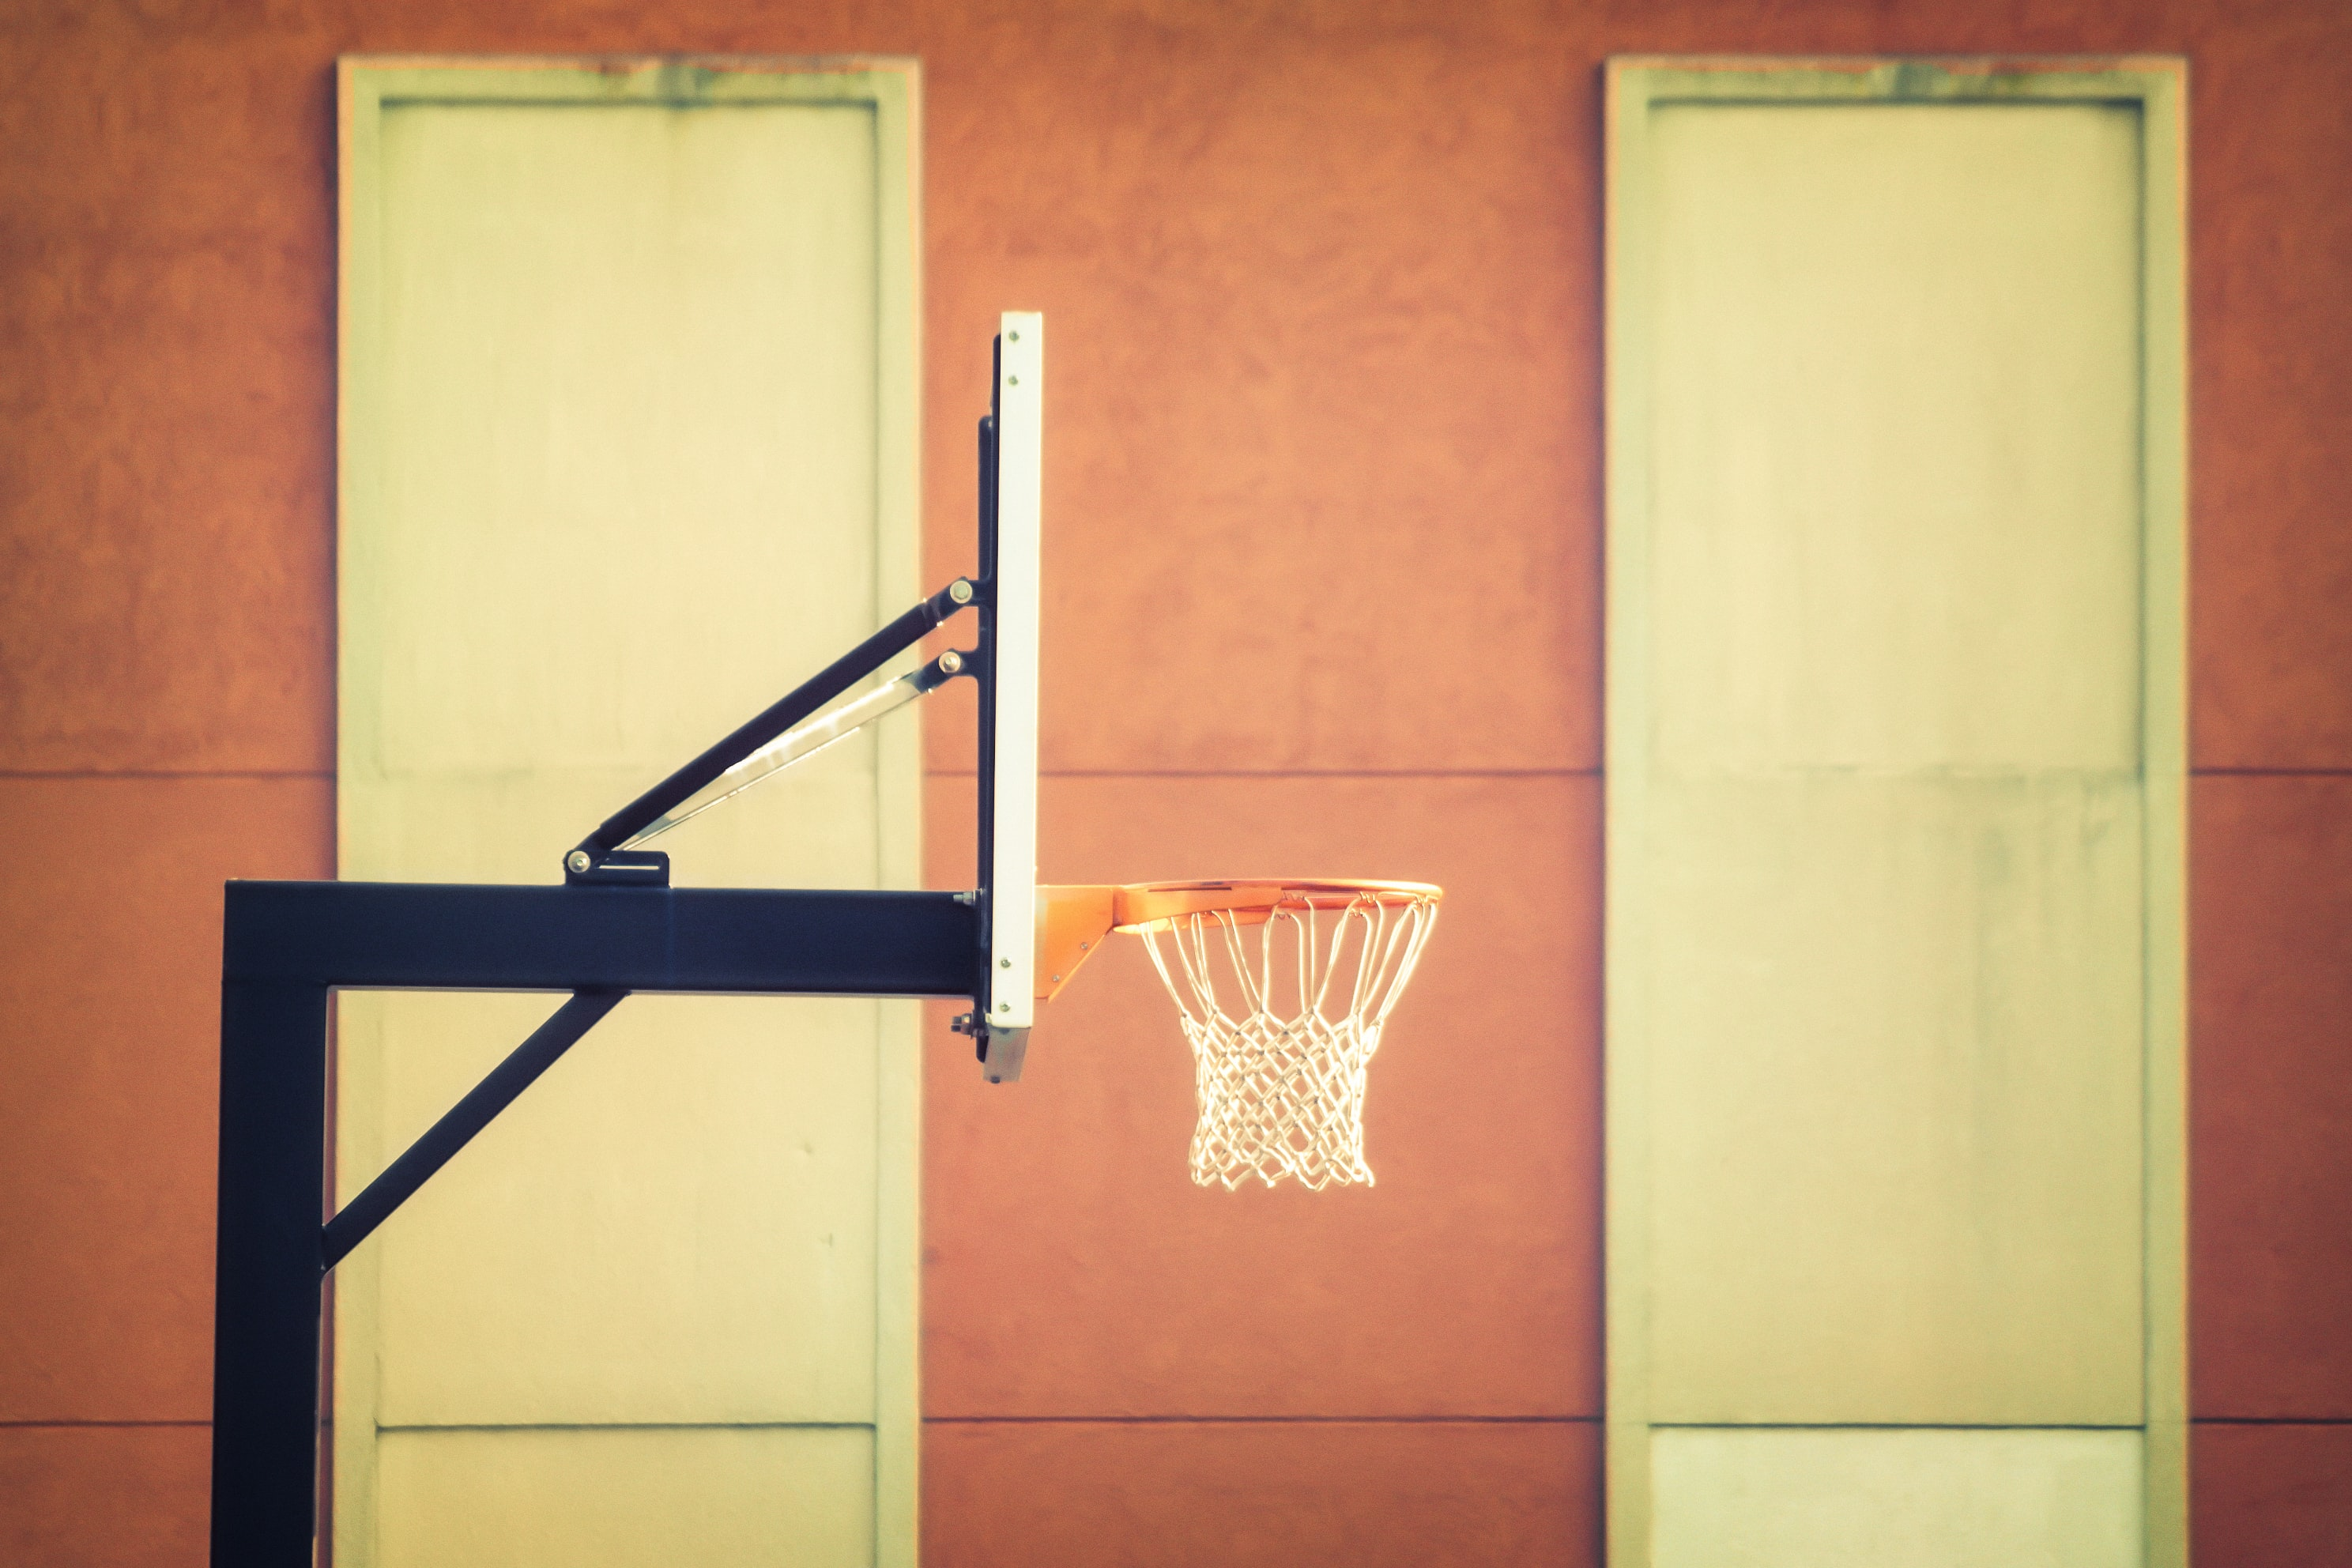 black and white portable basketball hoop